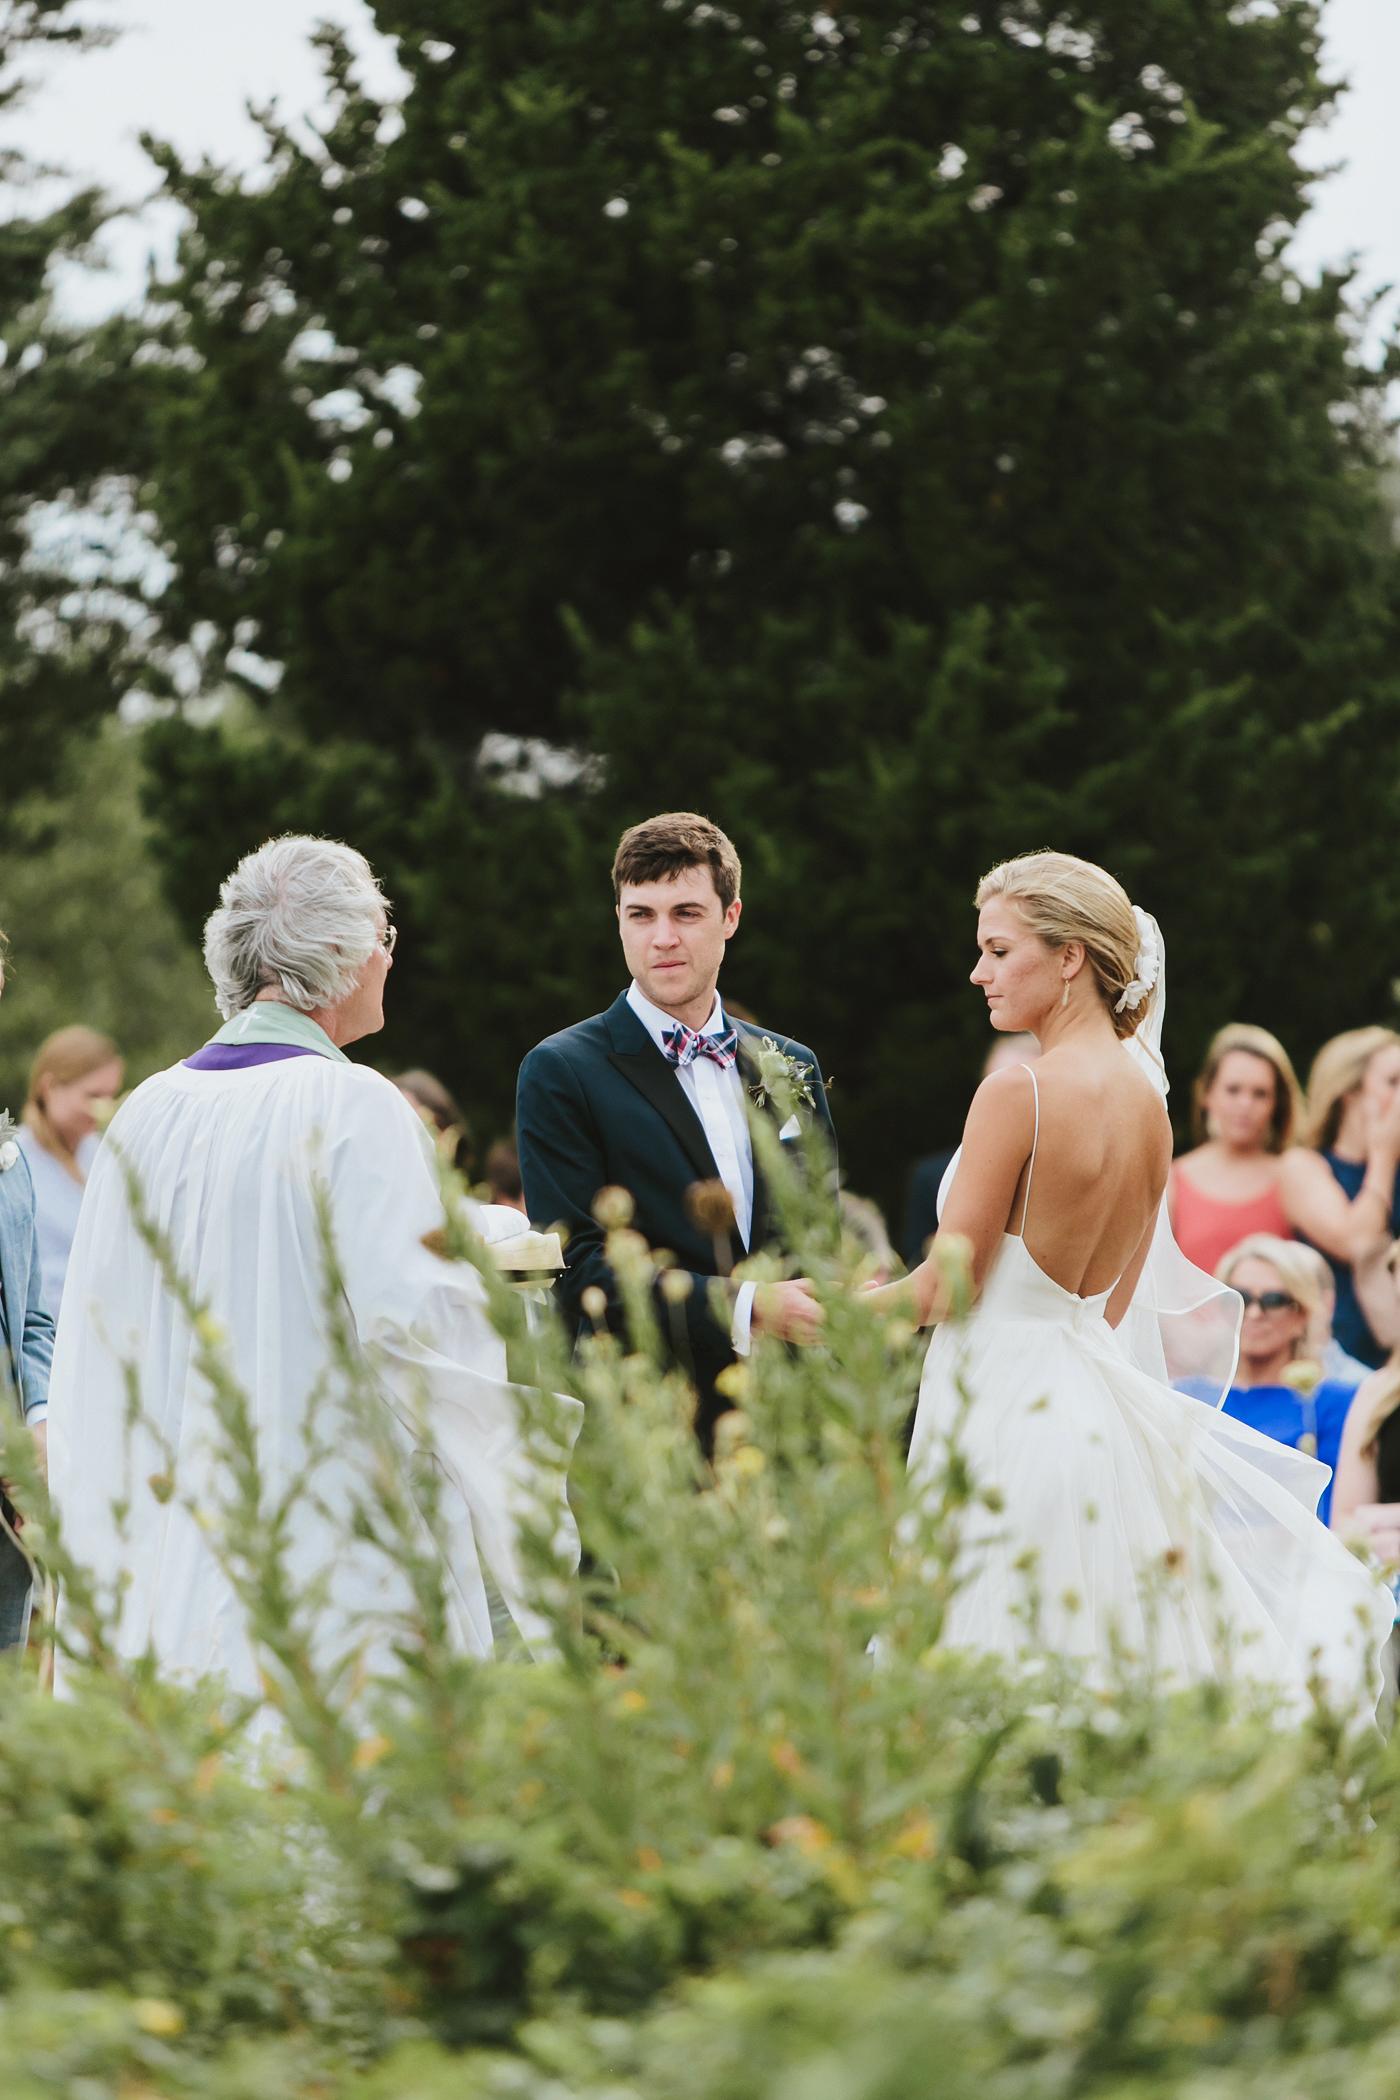 hadley corey wedding ceremony